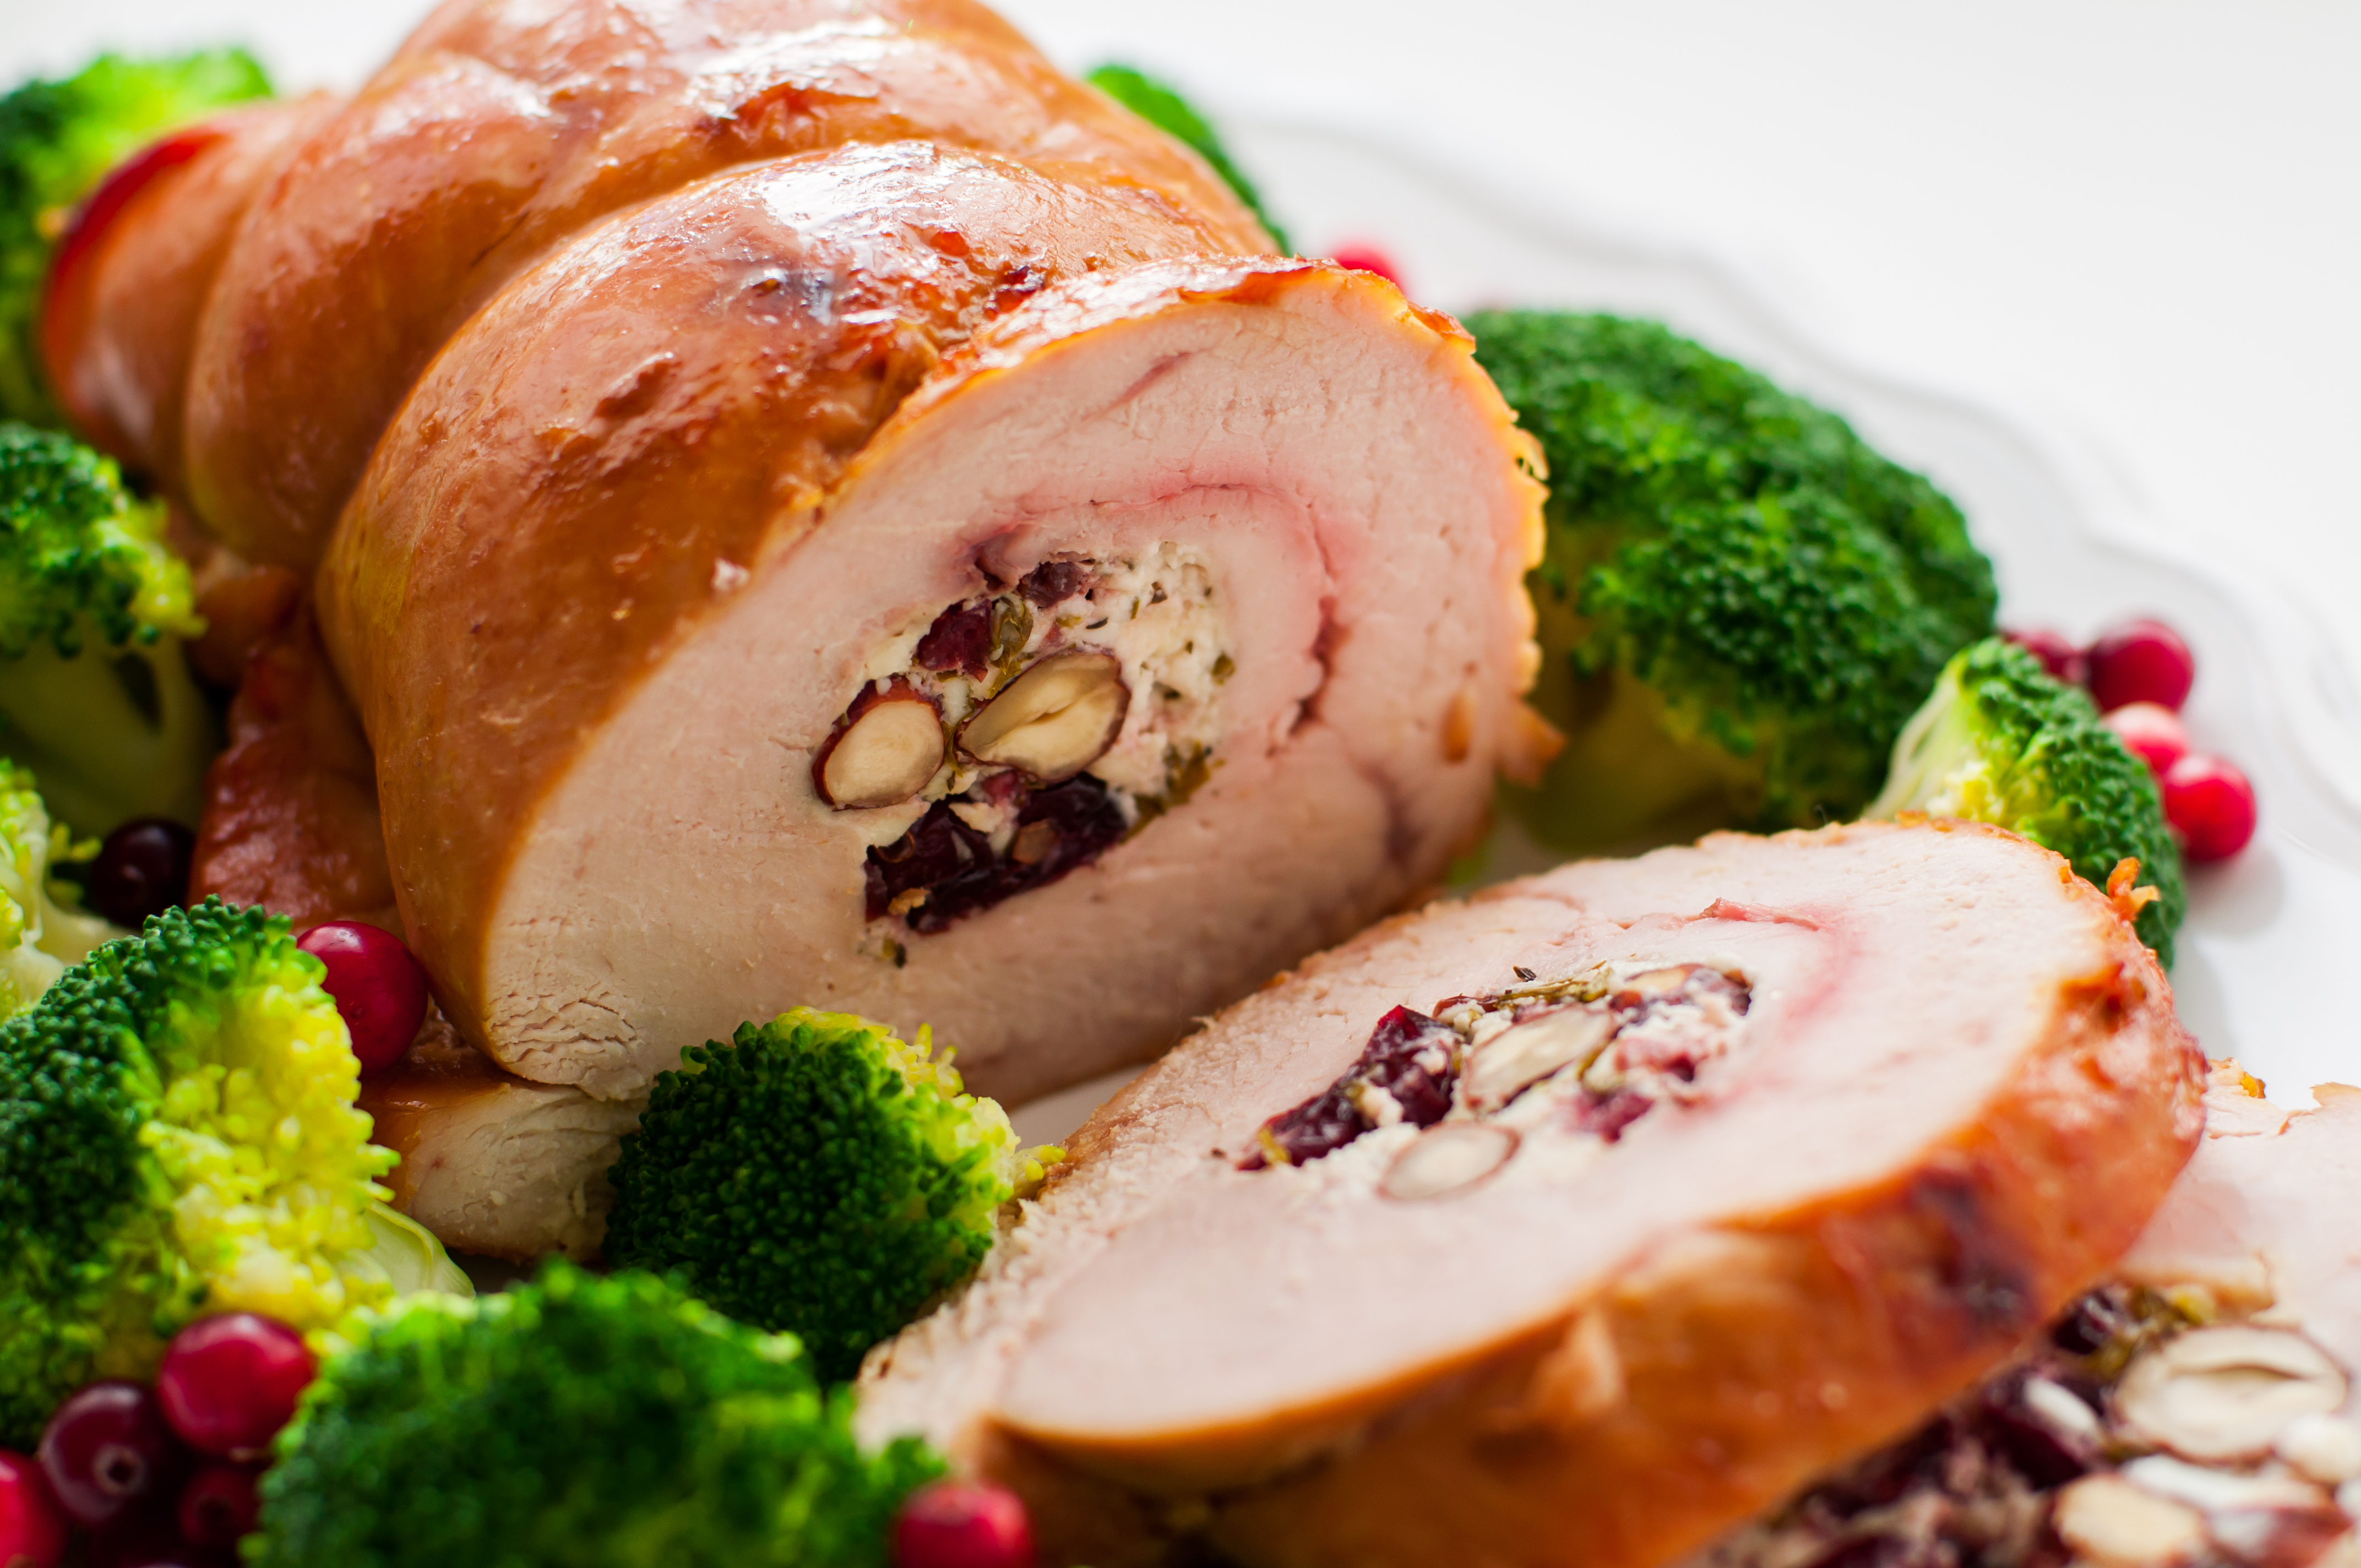 Turkey roll up